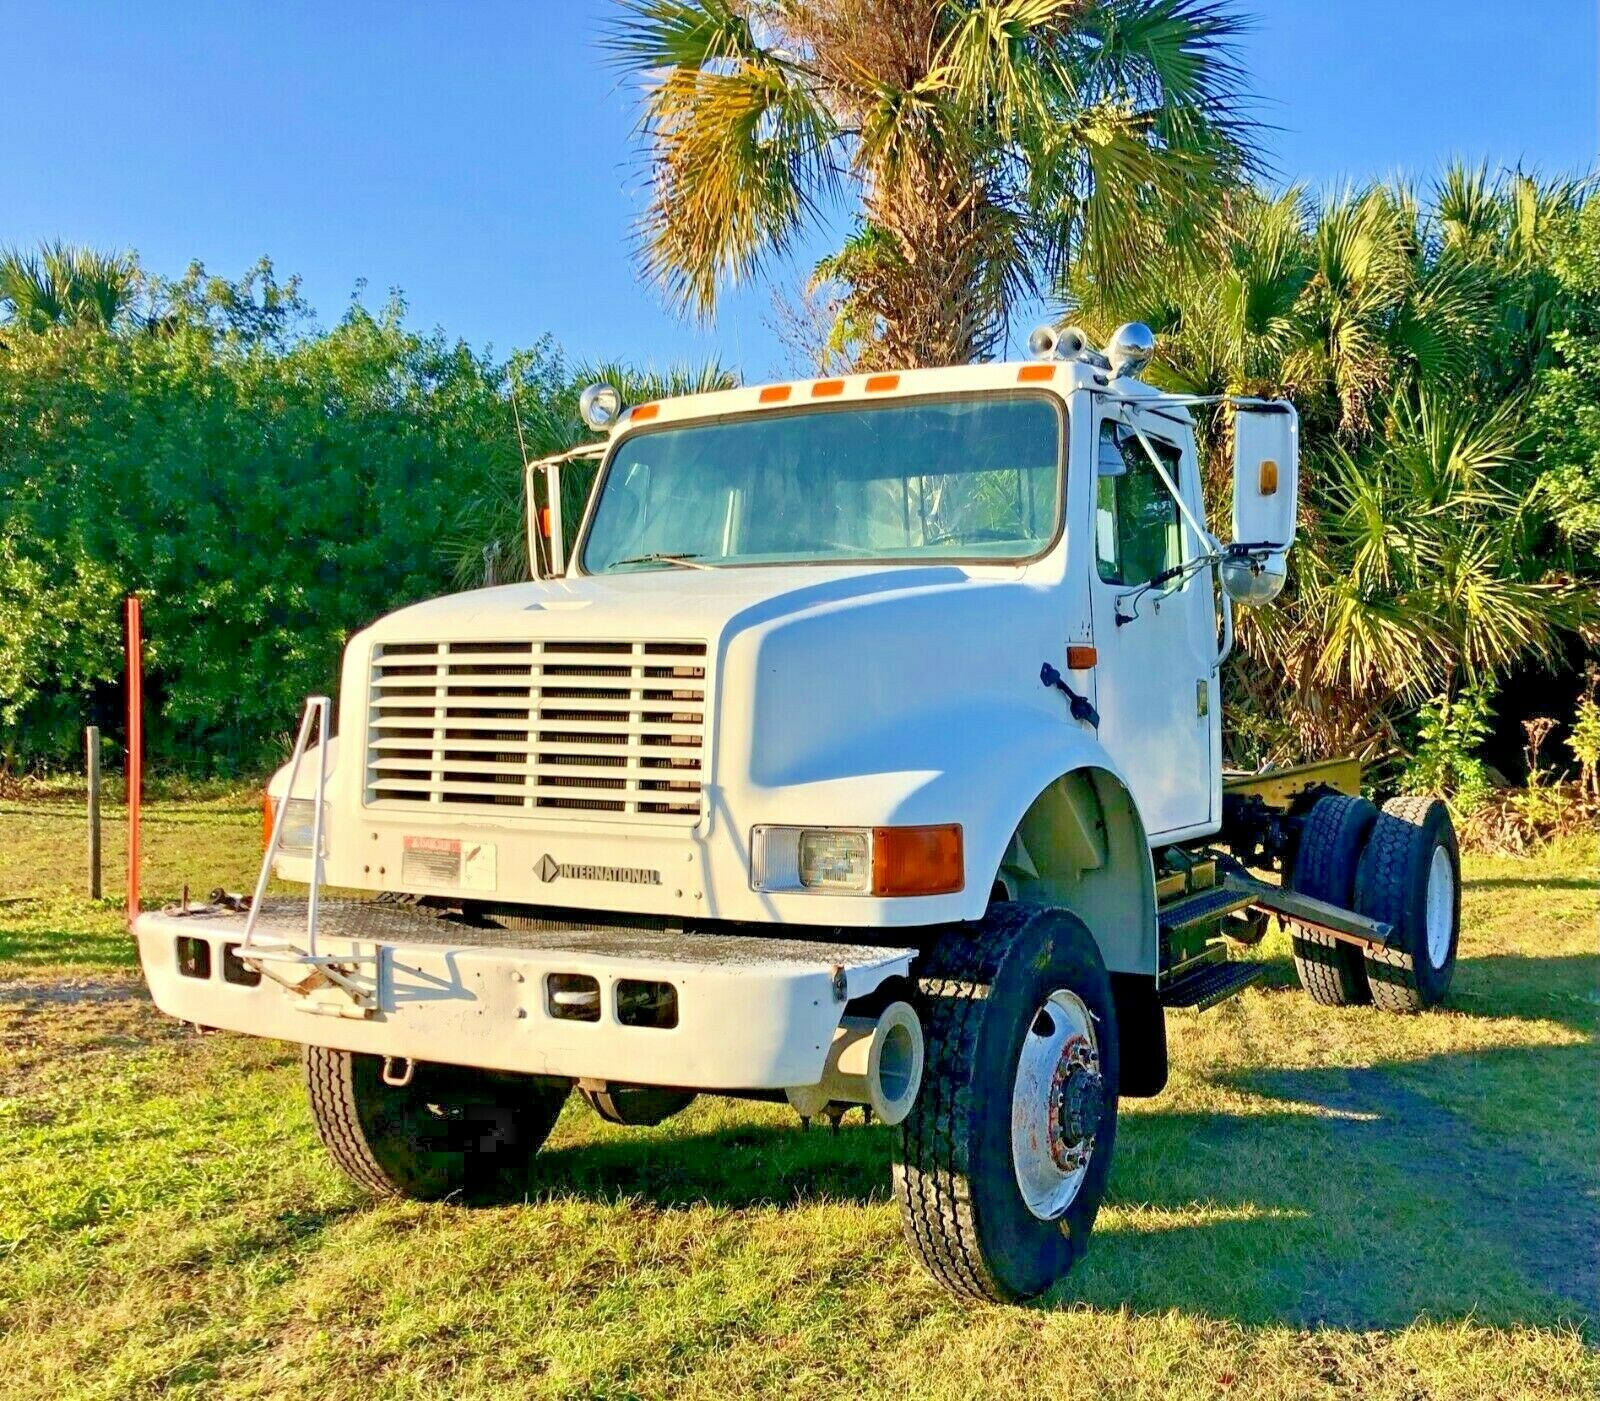 1992 International 4800 4x4 Single Axle 33K GVW Diesel Automatic